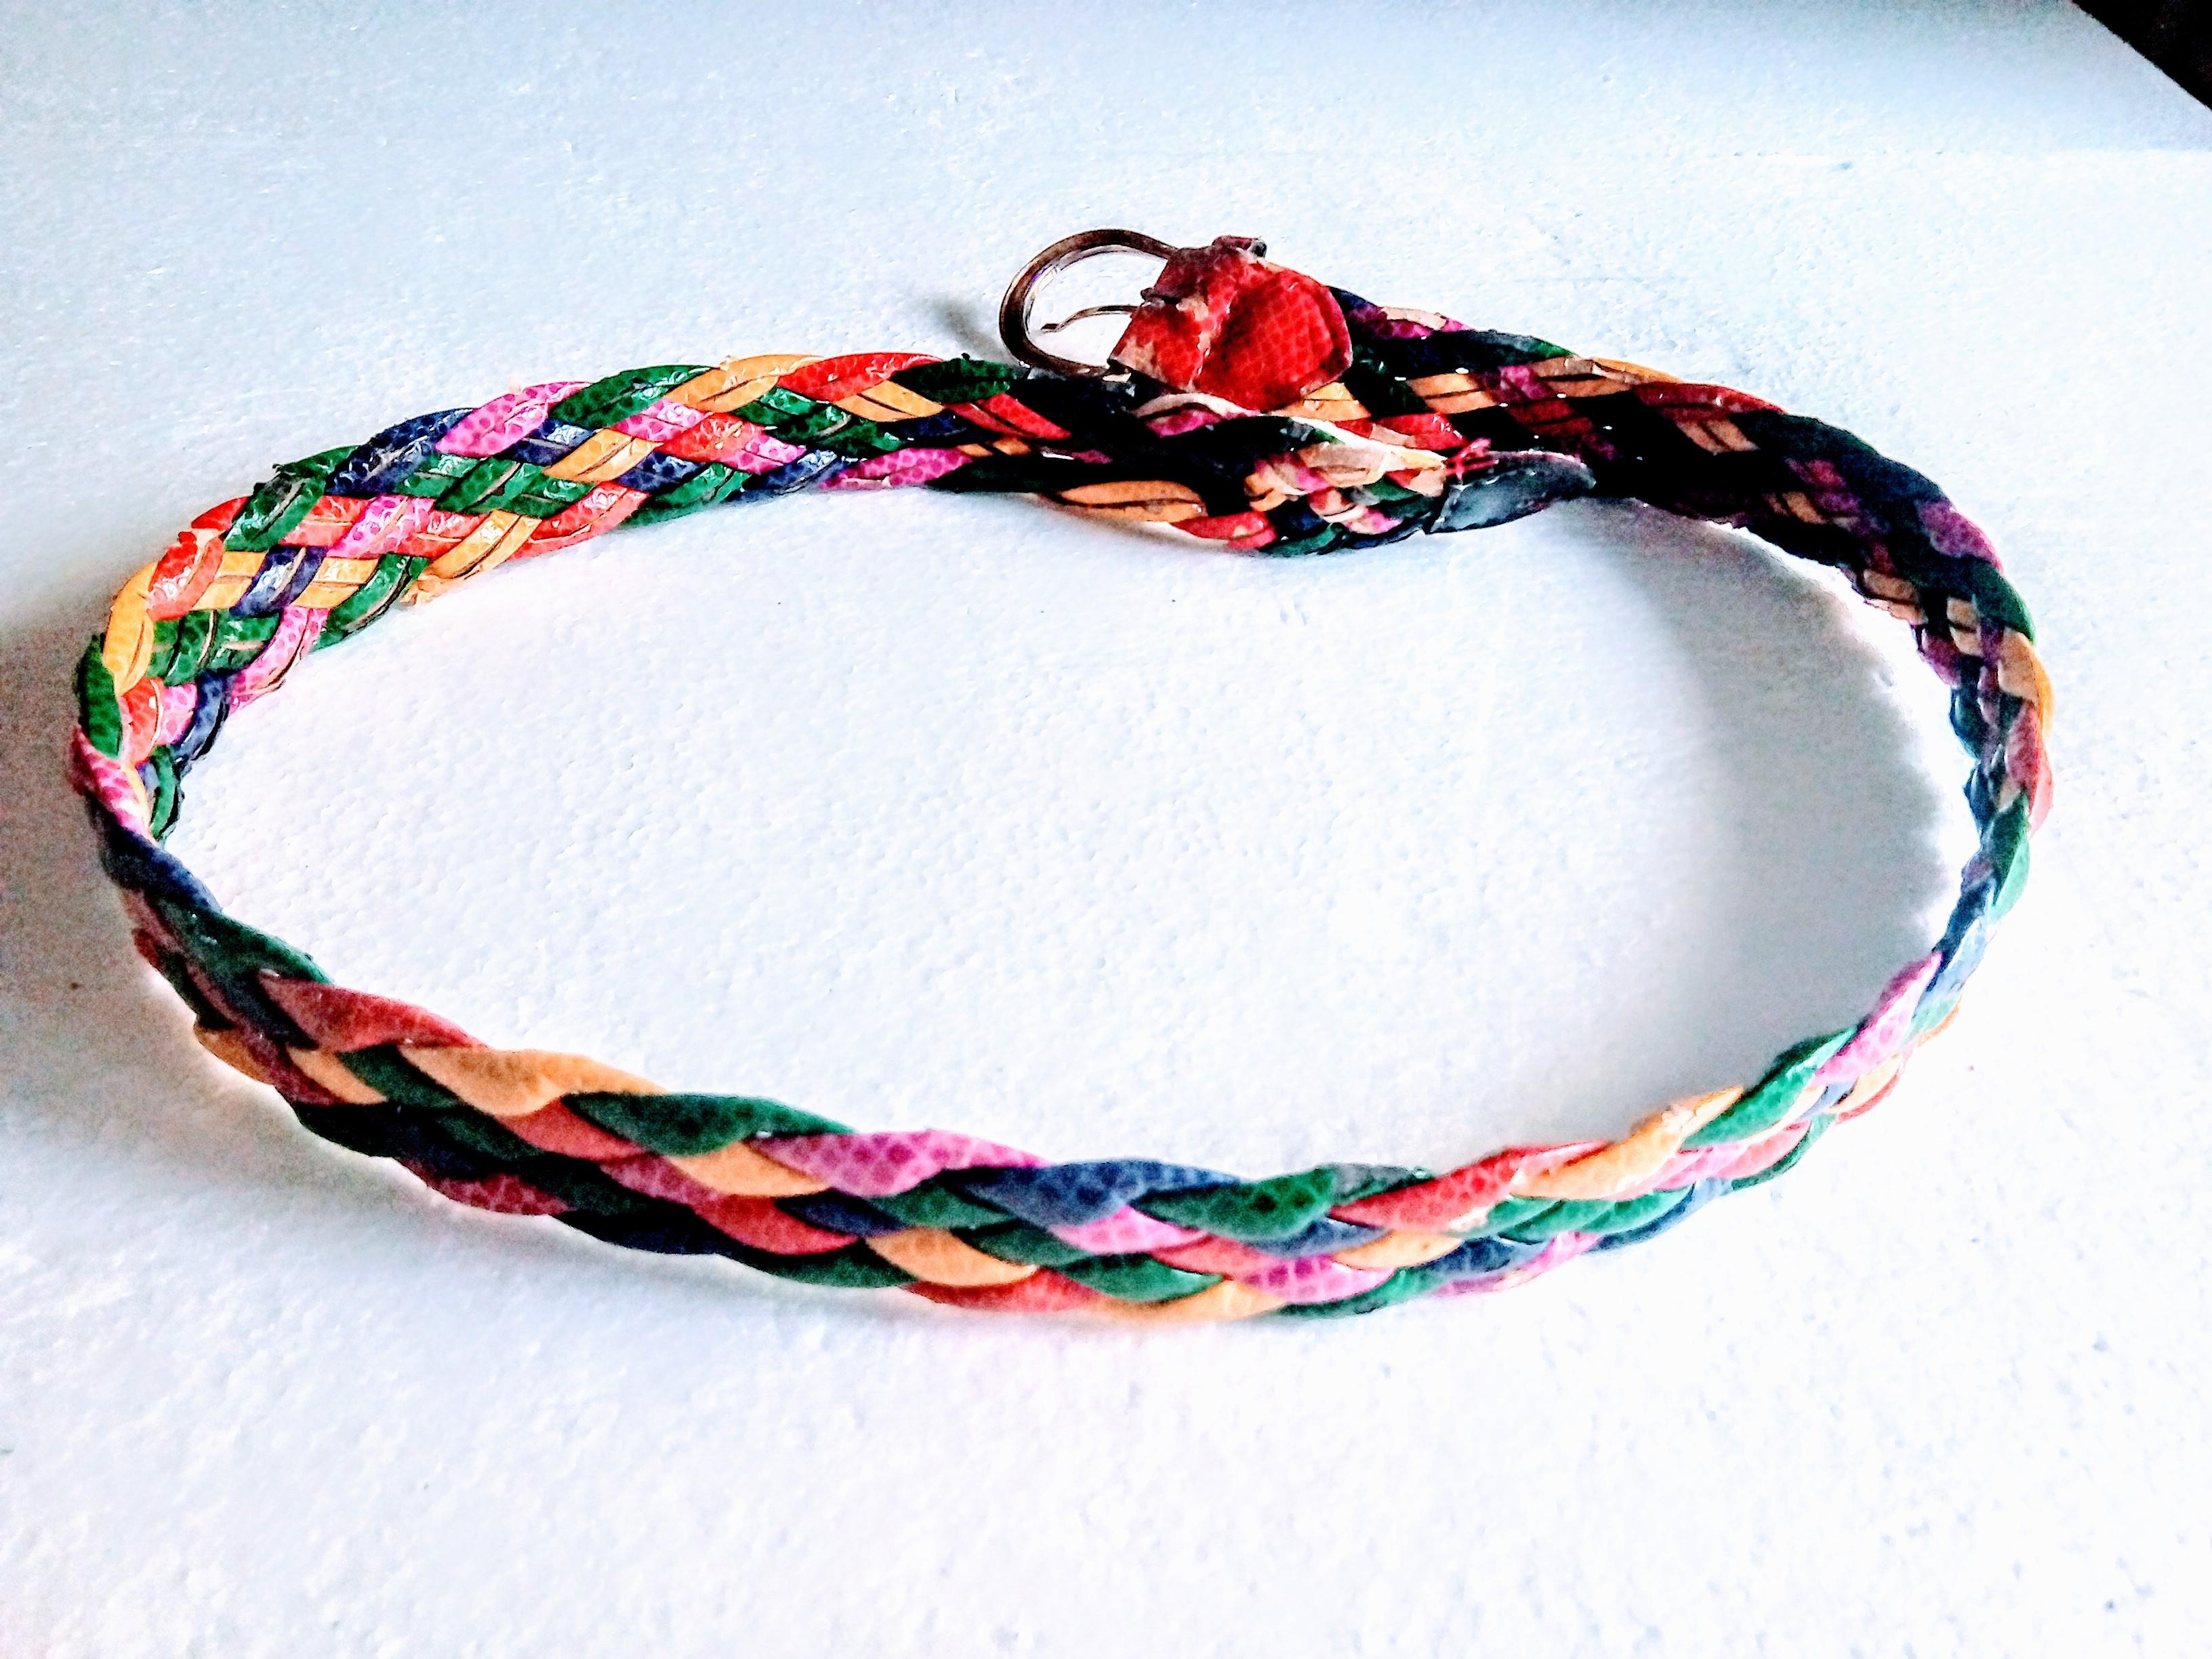 troc de troc ceinture tressÉe multicolore image 2